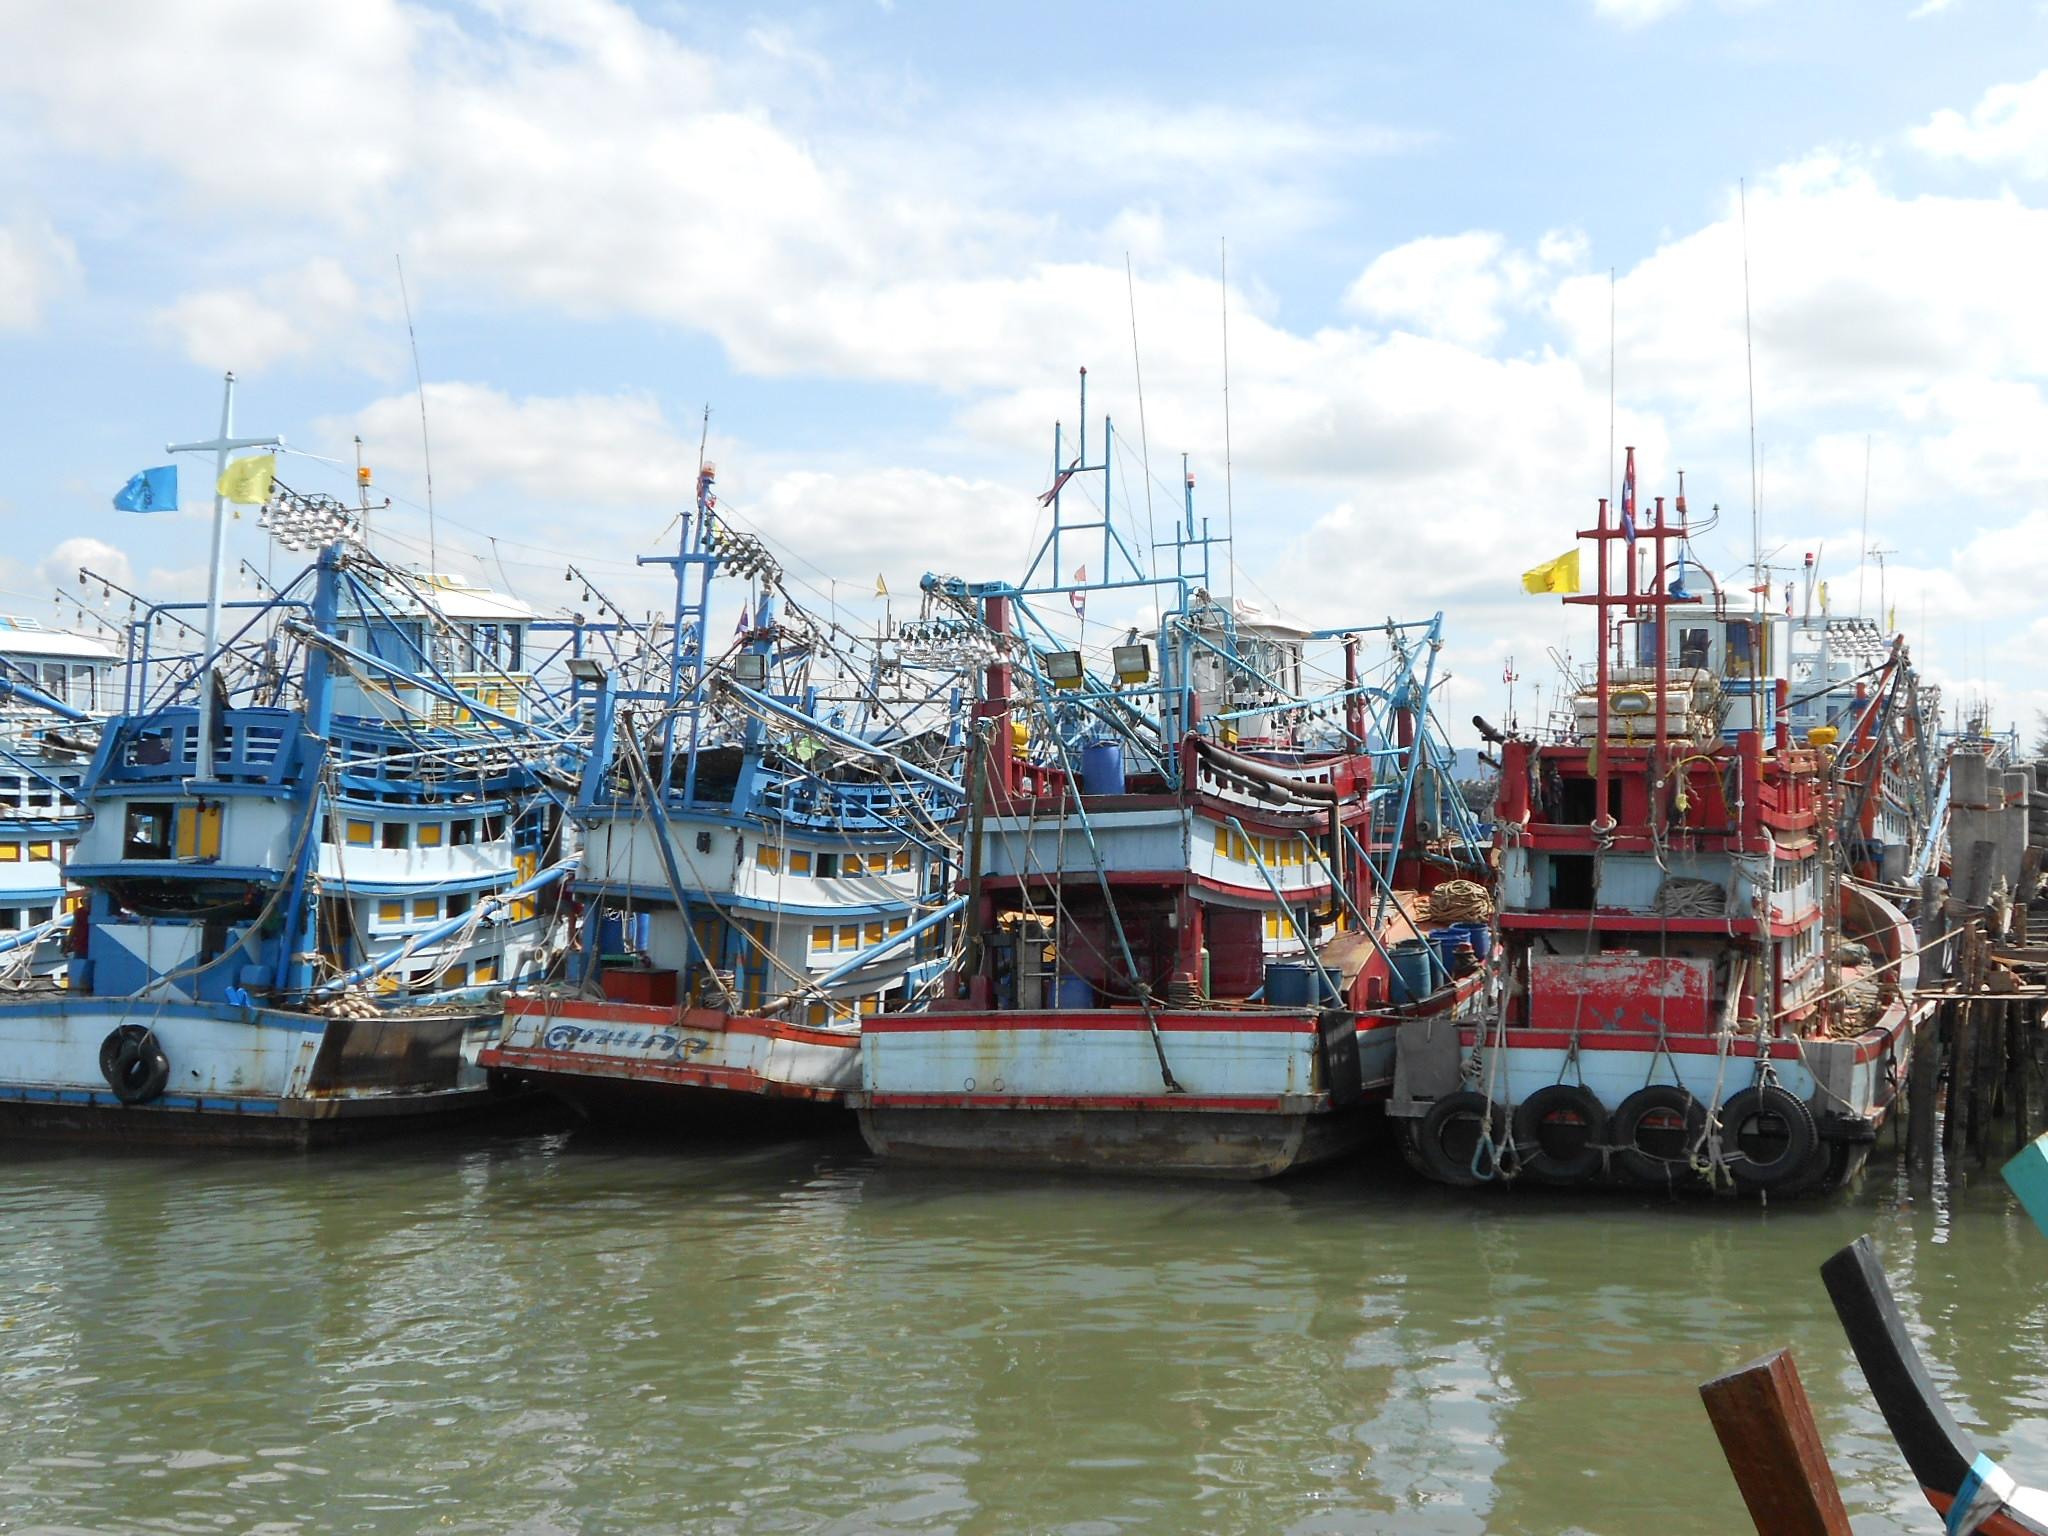 Boats of Pak Barrában